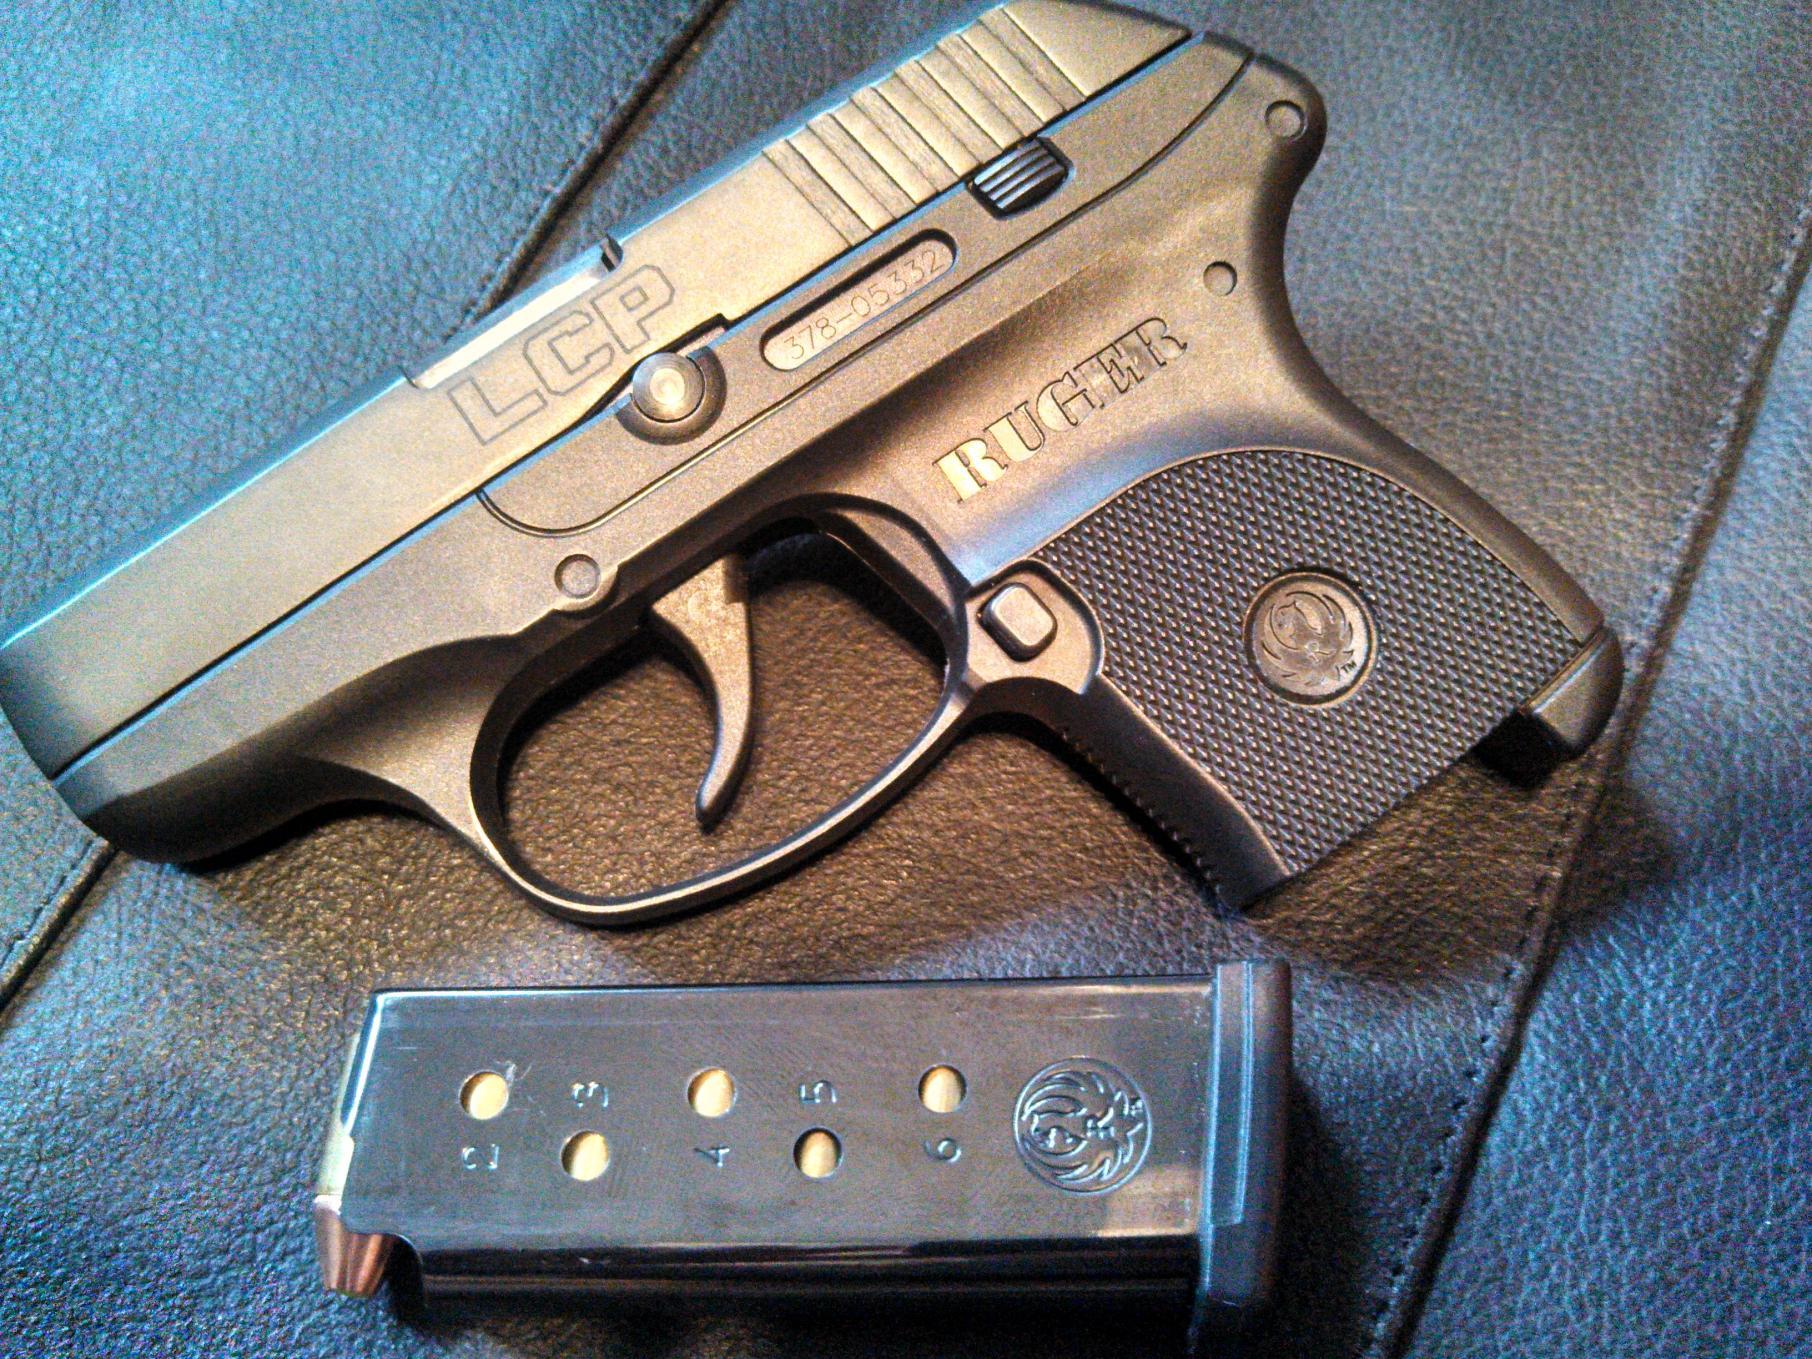 New Gun-img_20130702_175007_125.jpg